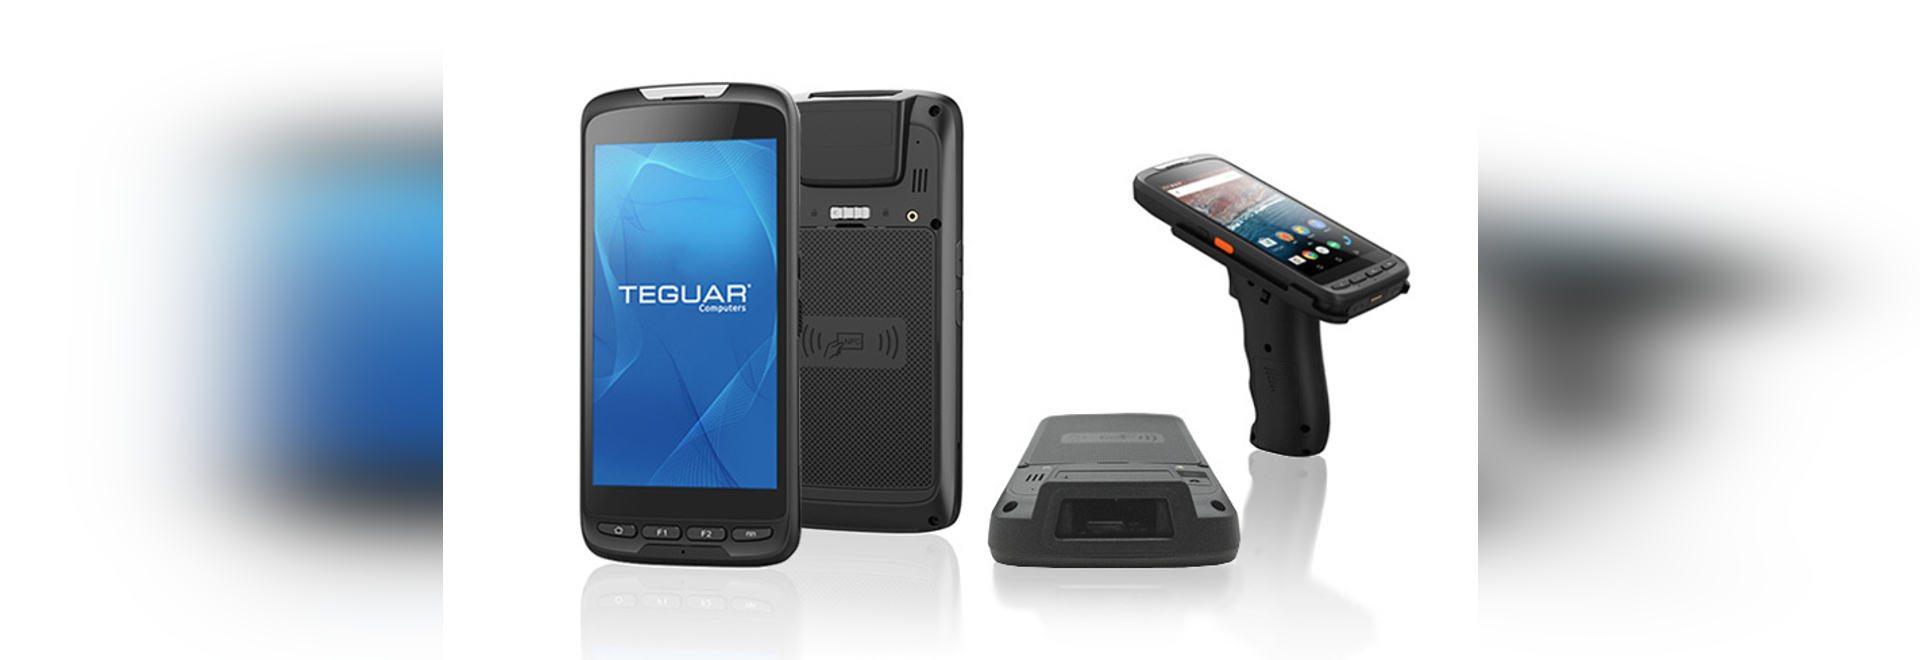 "Teguar 5"" Rugged Handheld Device | TRH-A5380-05"